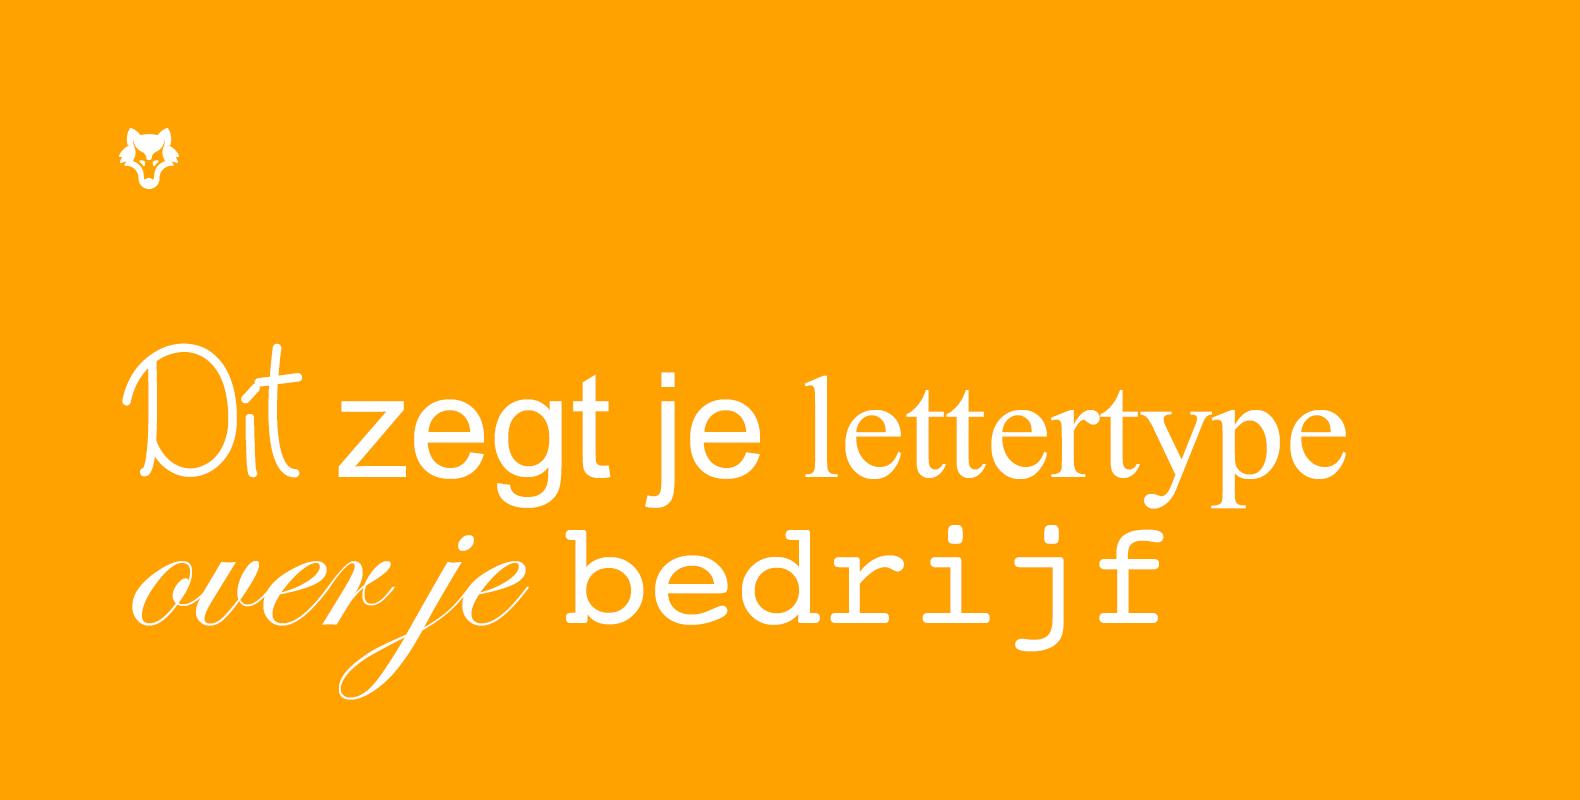 Dít zegt je lettertype over je bedrijf